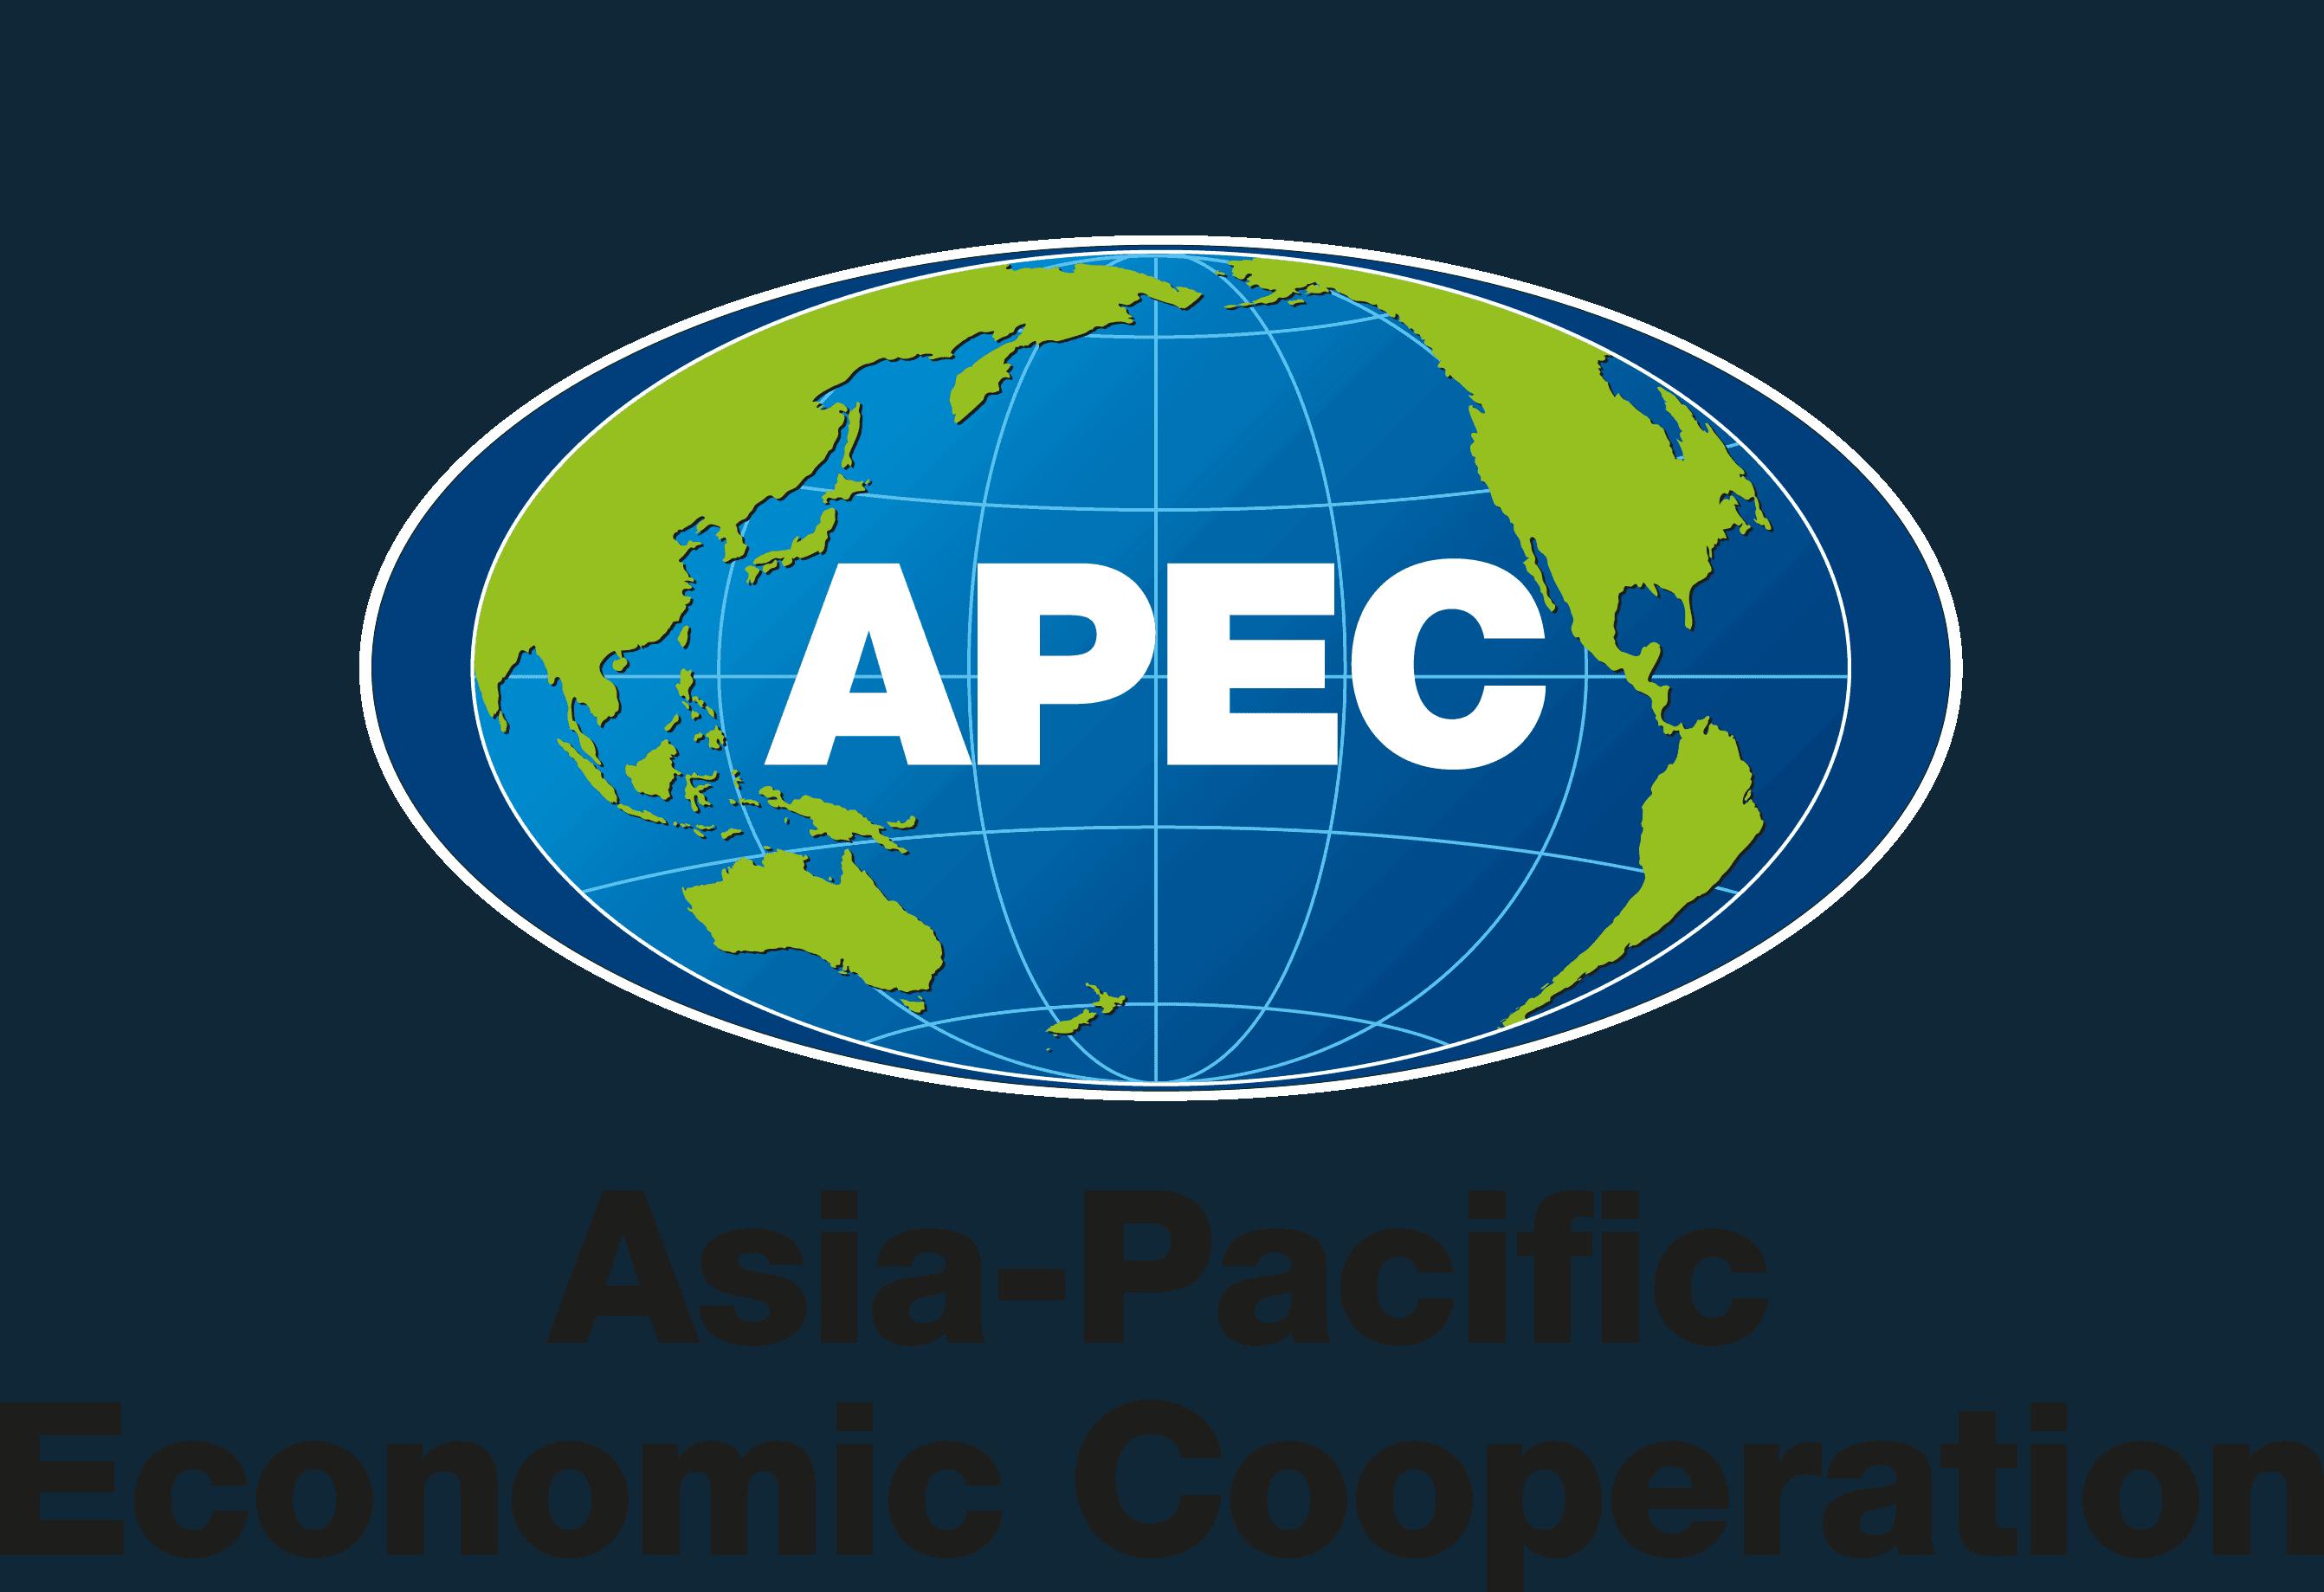 APEC Logo Vector EPS Free Download, Logo, Icons, Brand Emblems